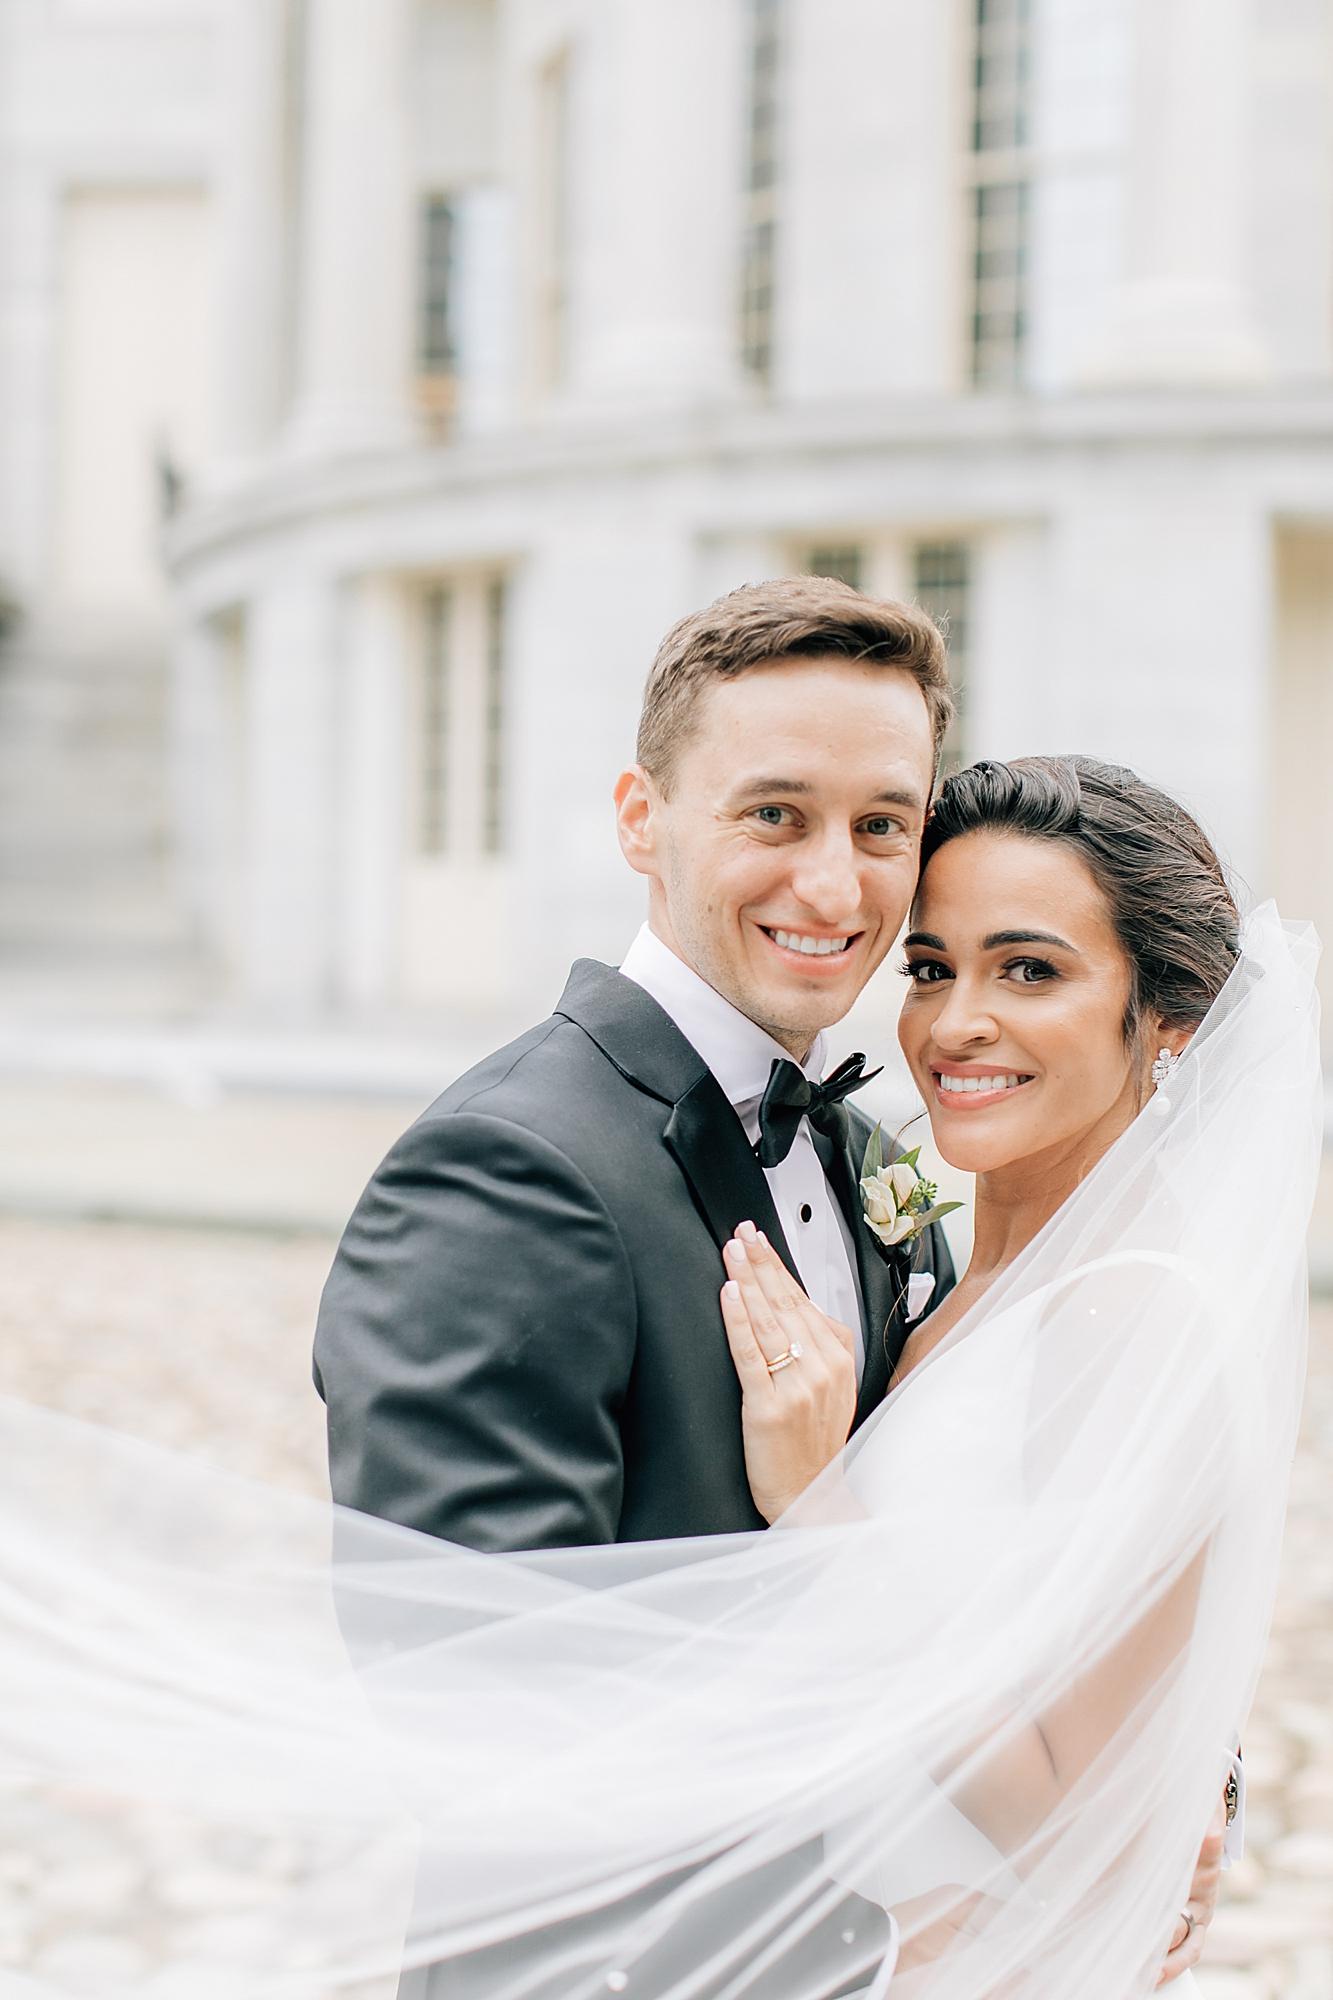 Cescaphe Philadelphia Film Wedding Photography by Magdalena Studios 31